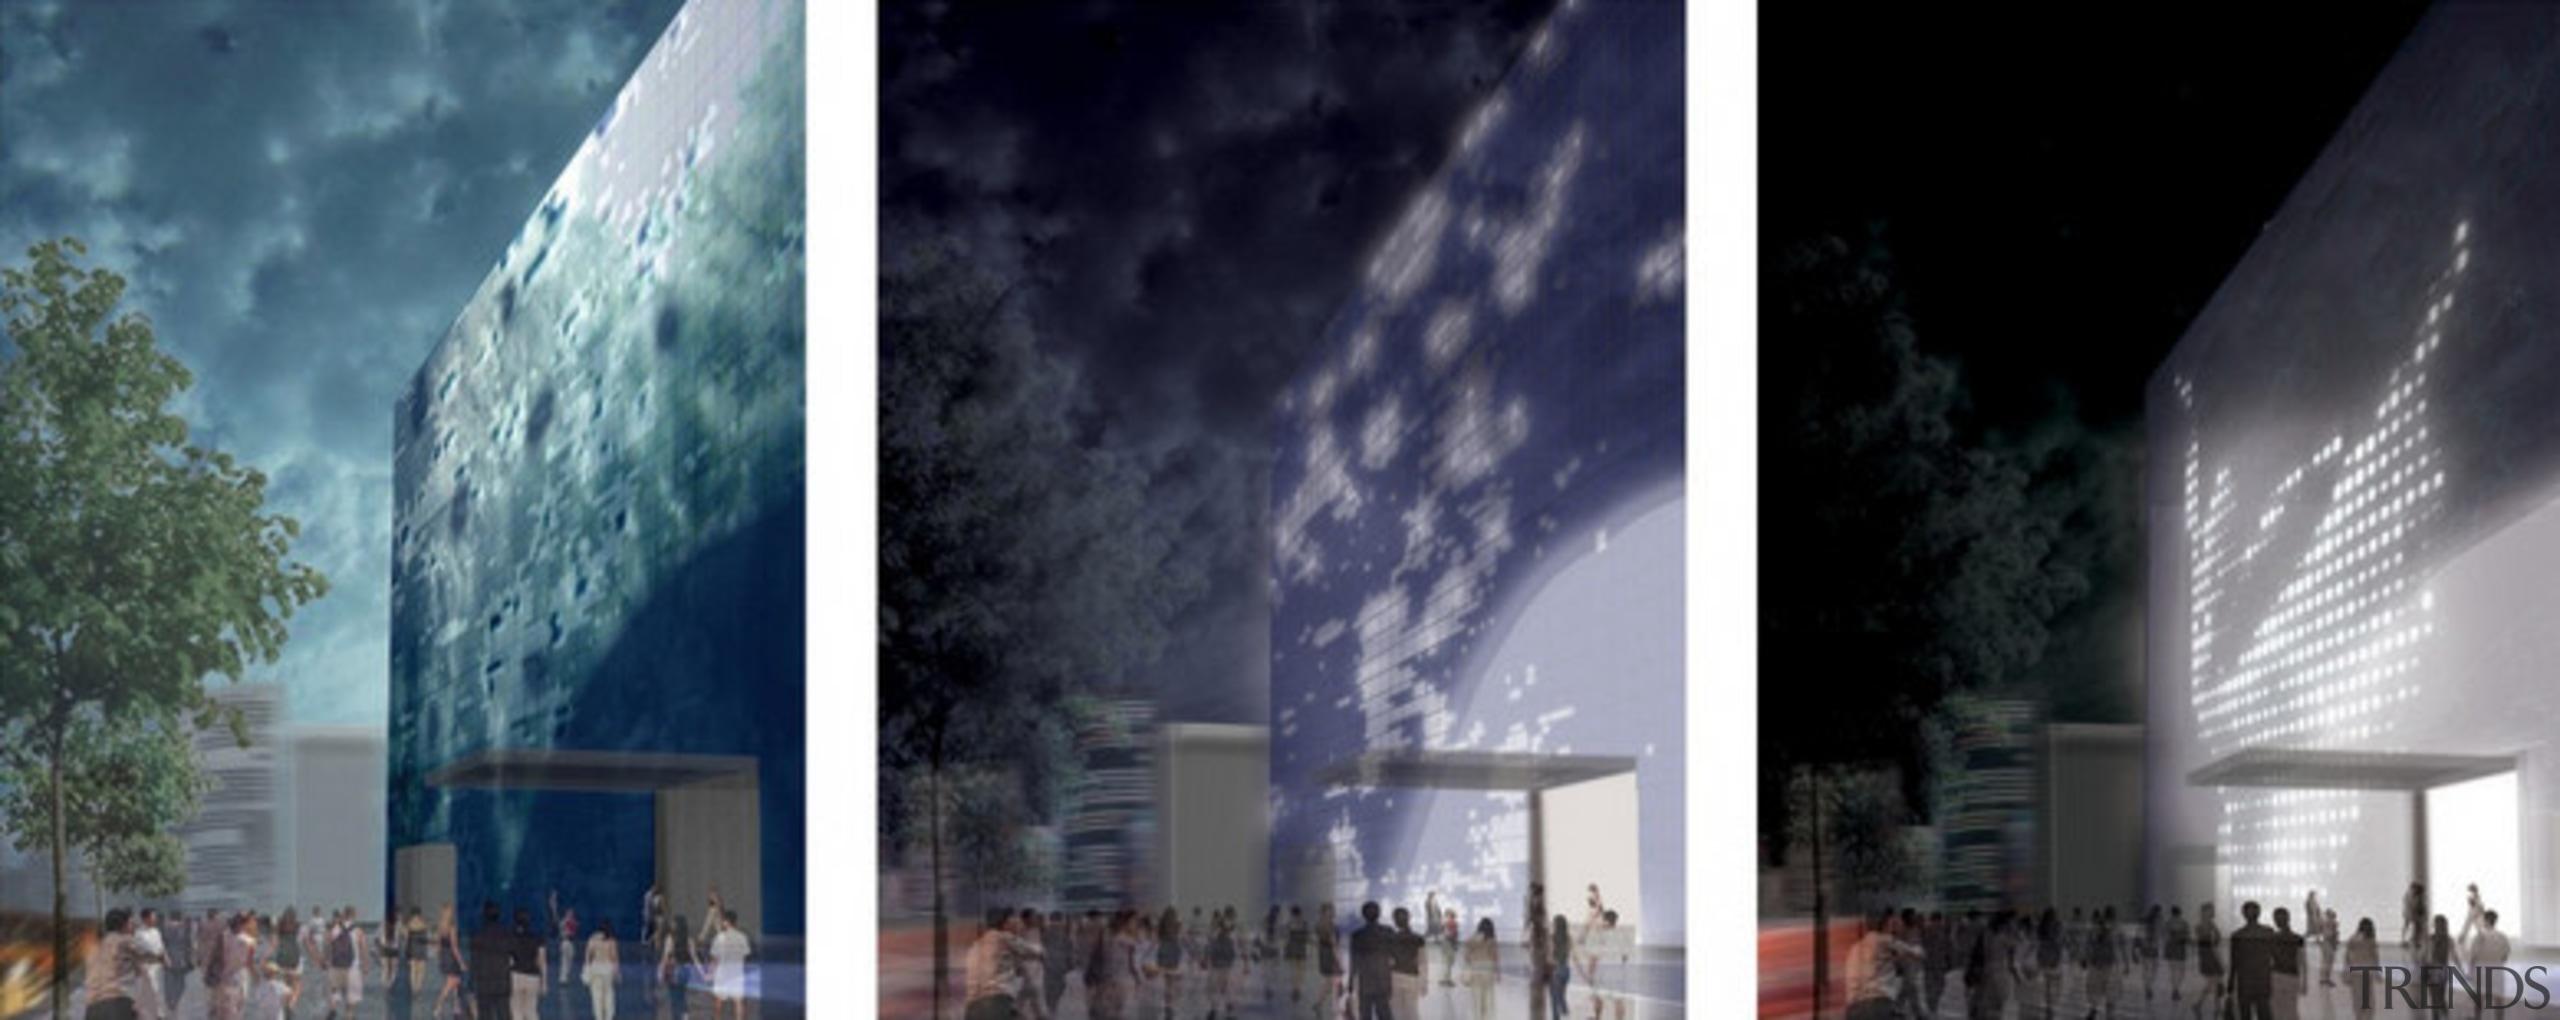 Designed by SGP Architects the GreenPix Zero Energy architecture, building, facade, landmark, metropolis, phenomenon, sky, skyscraper, tourist attraction, gray, black